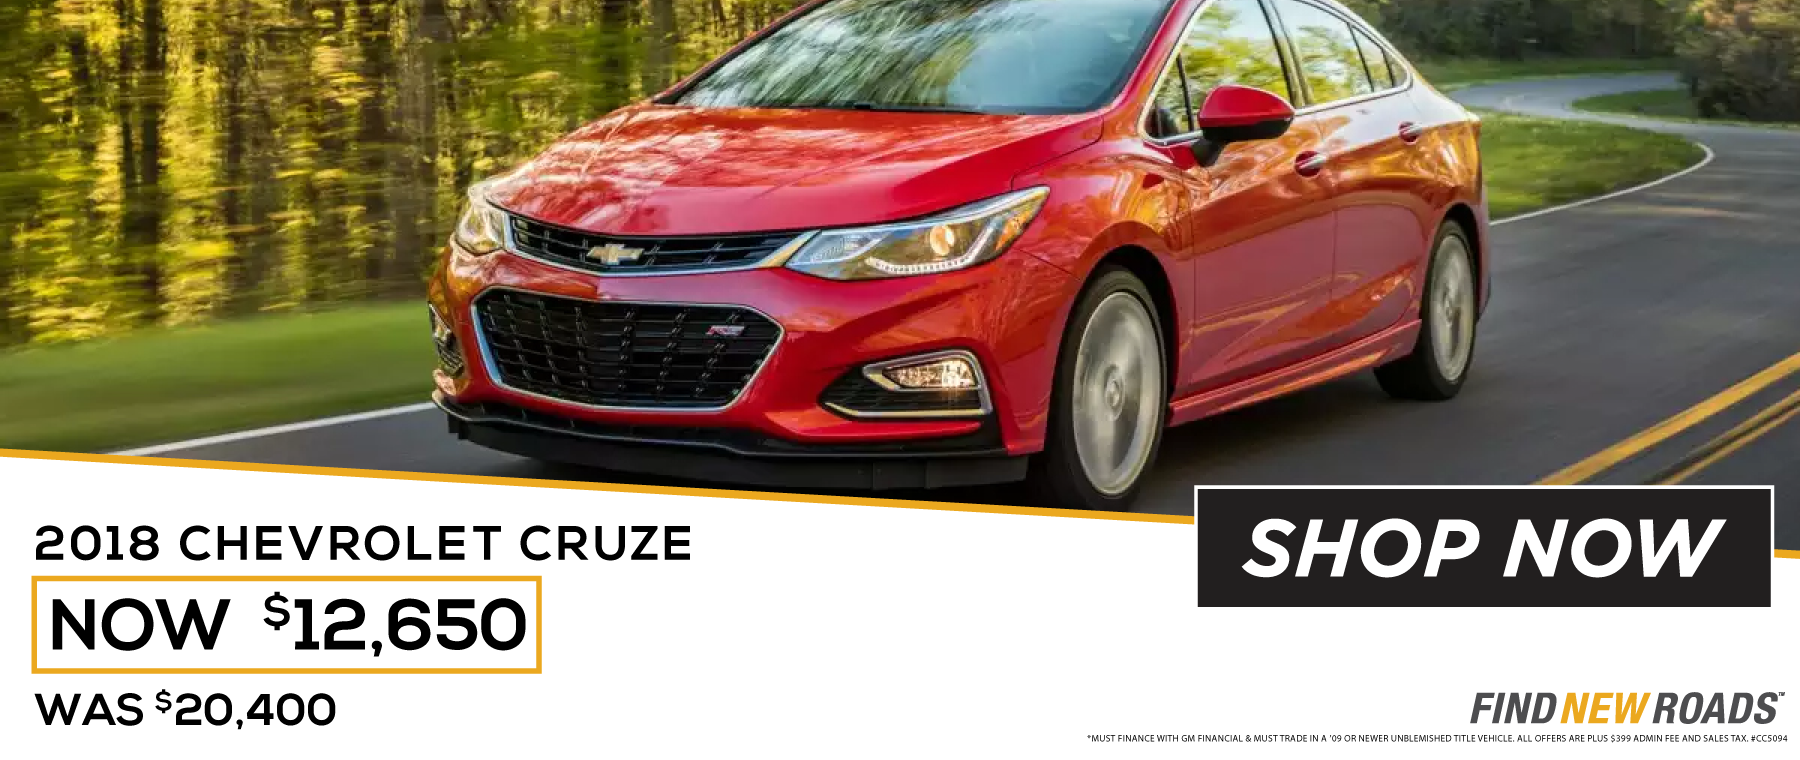 Moore Auto Sales >> Select Motors Wichita Ks - impremedia.net